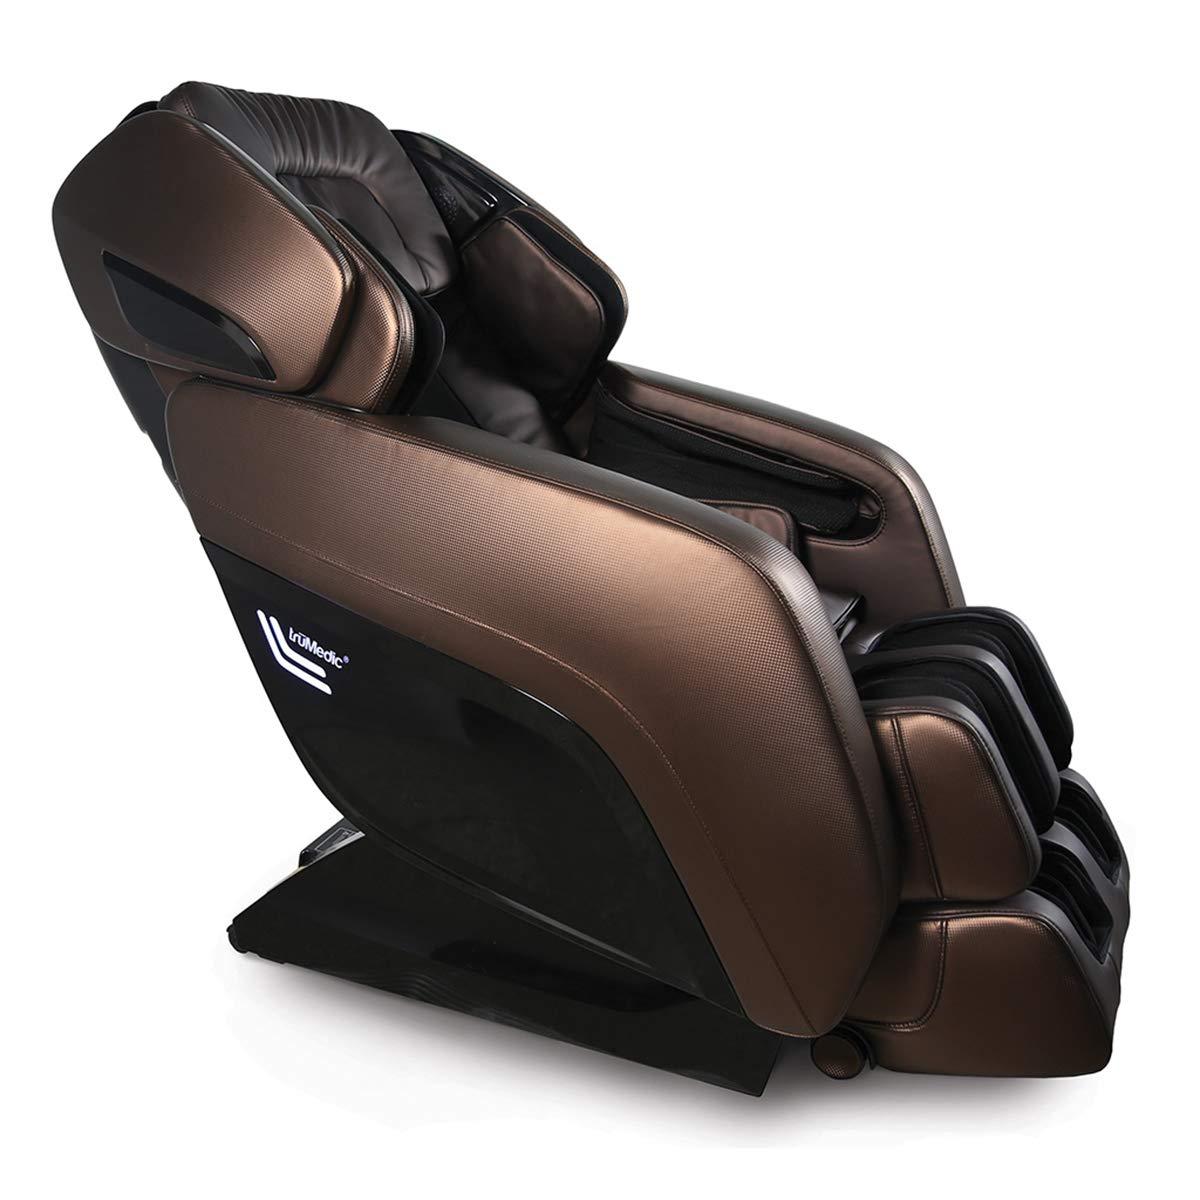 truMedic Instashiatsu 3D Massage Chair with Bluetooth Speaker - Shiatsu Lounge Style Recliner with Axis Rollers, Heated Seat & Zero Gravity Position - Refurbished & Recertified - Brown (MC-2000)